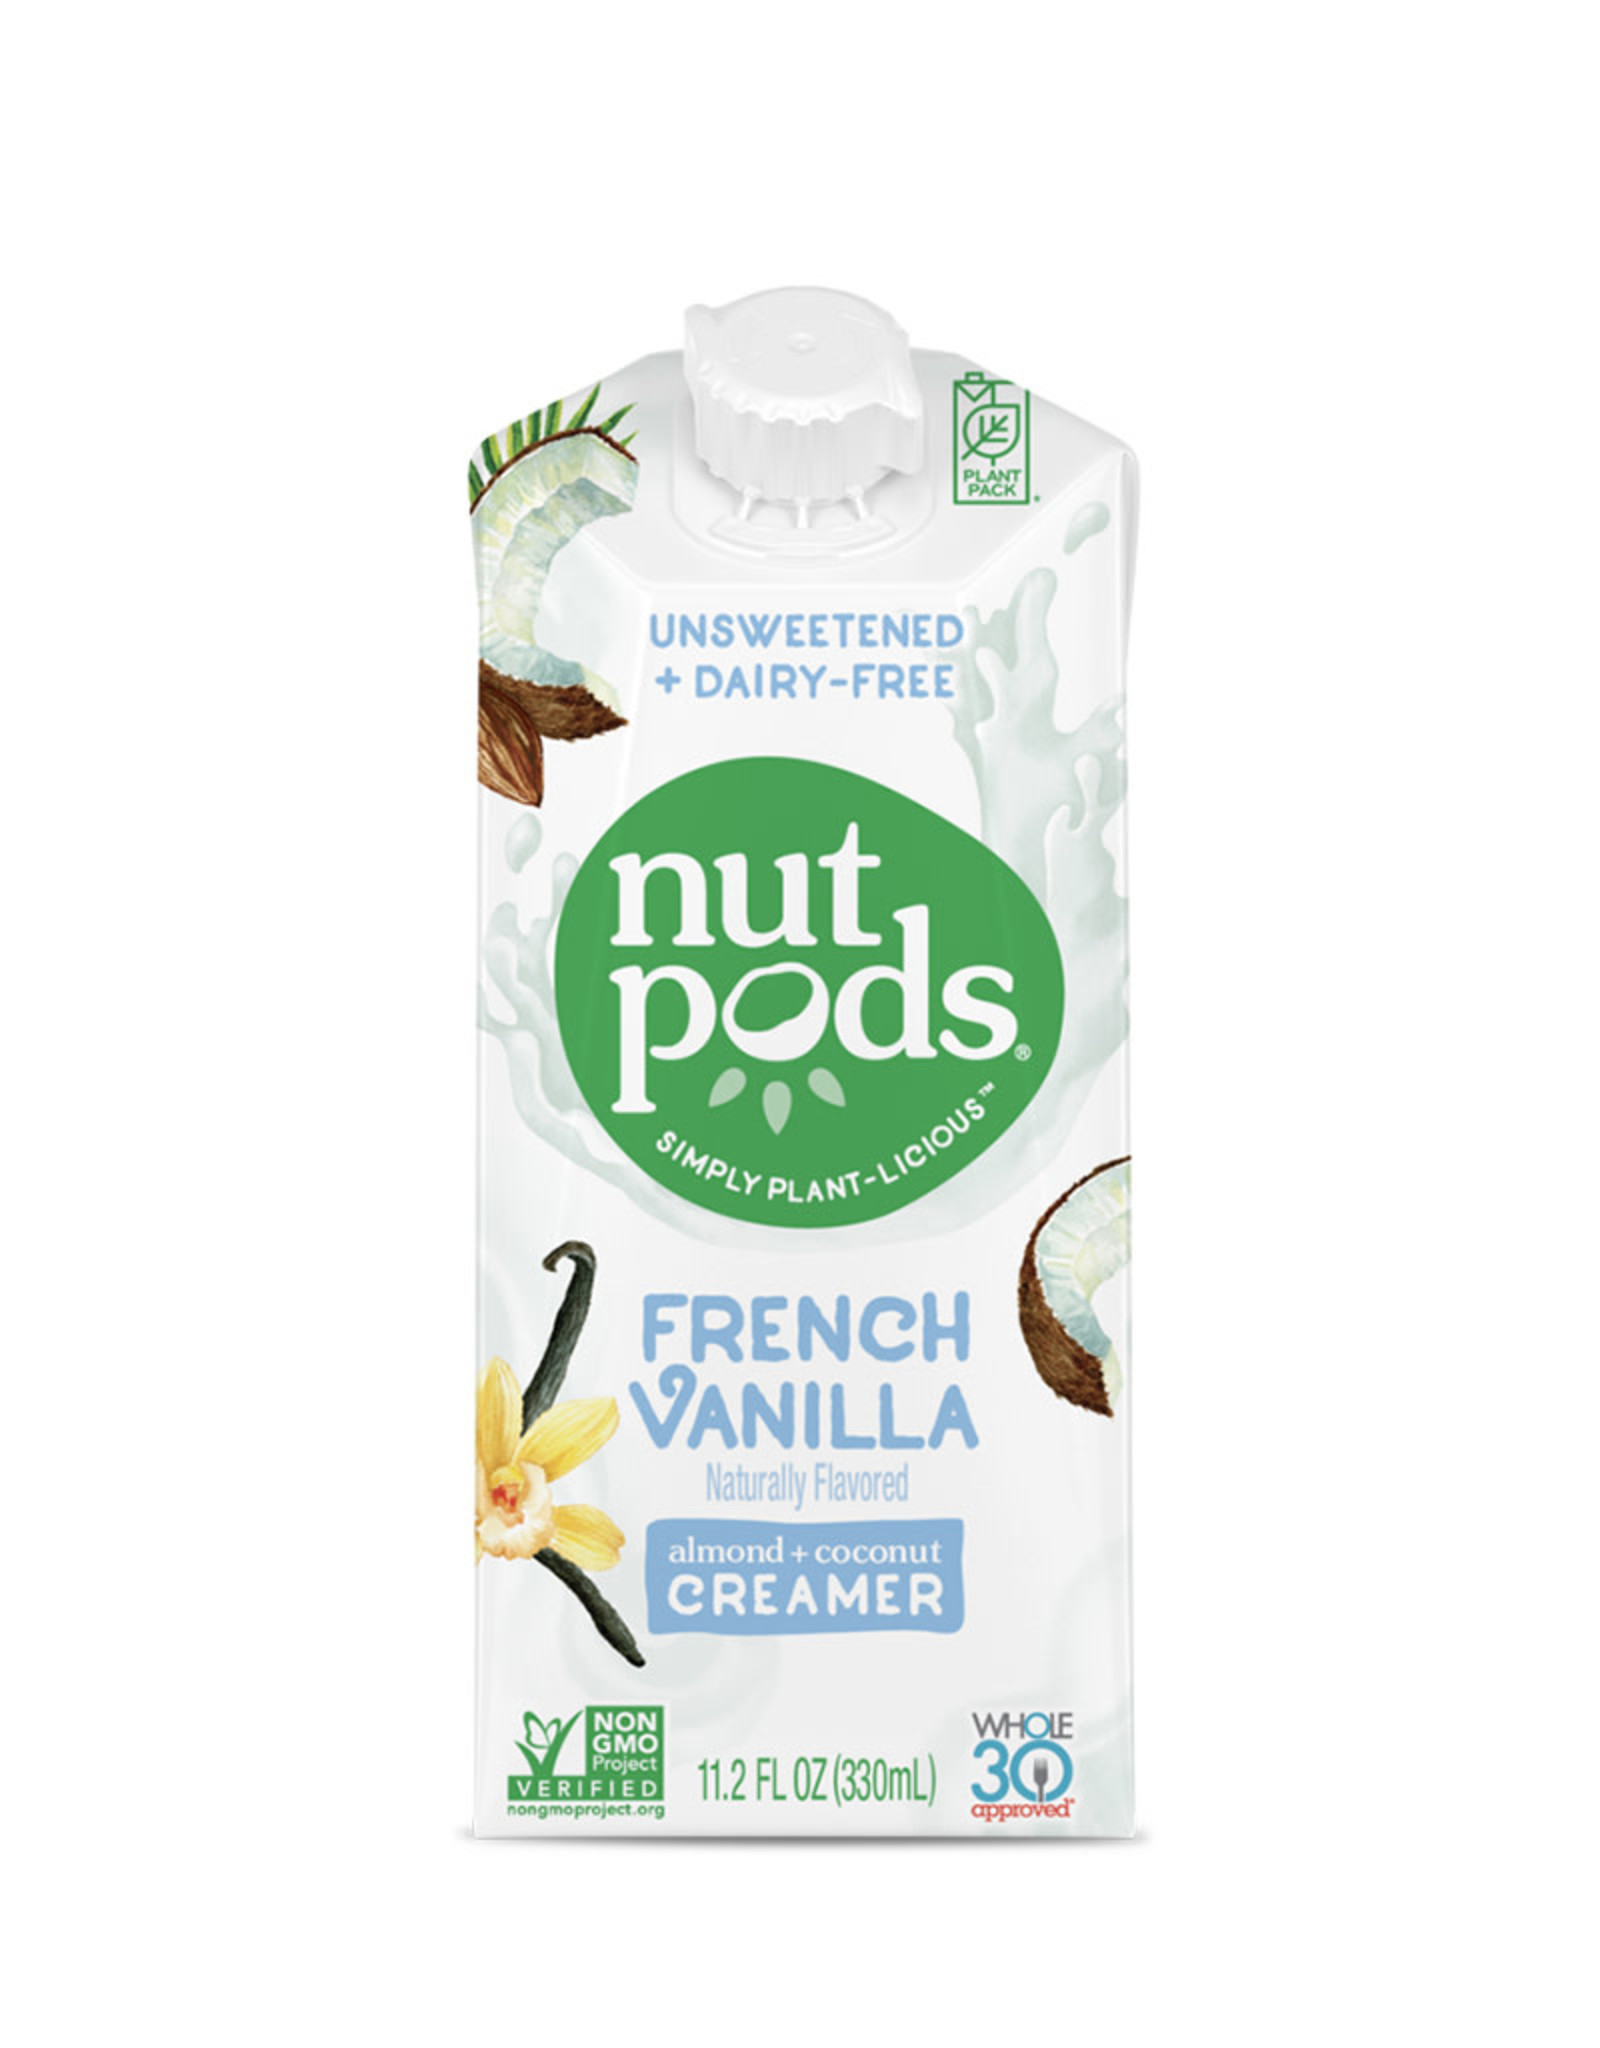 Nut Pods Nutpods - Unsweetened Dairy-Free Creamer, French Vanilla (330ml)